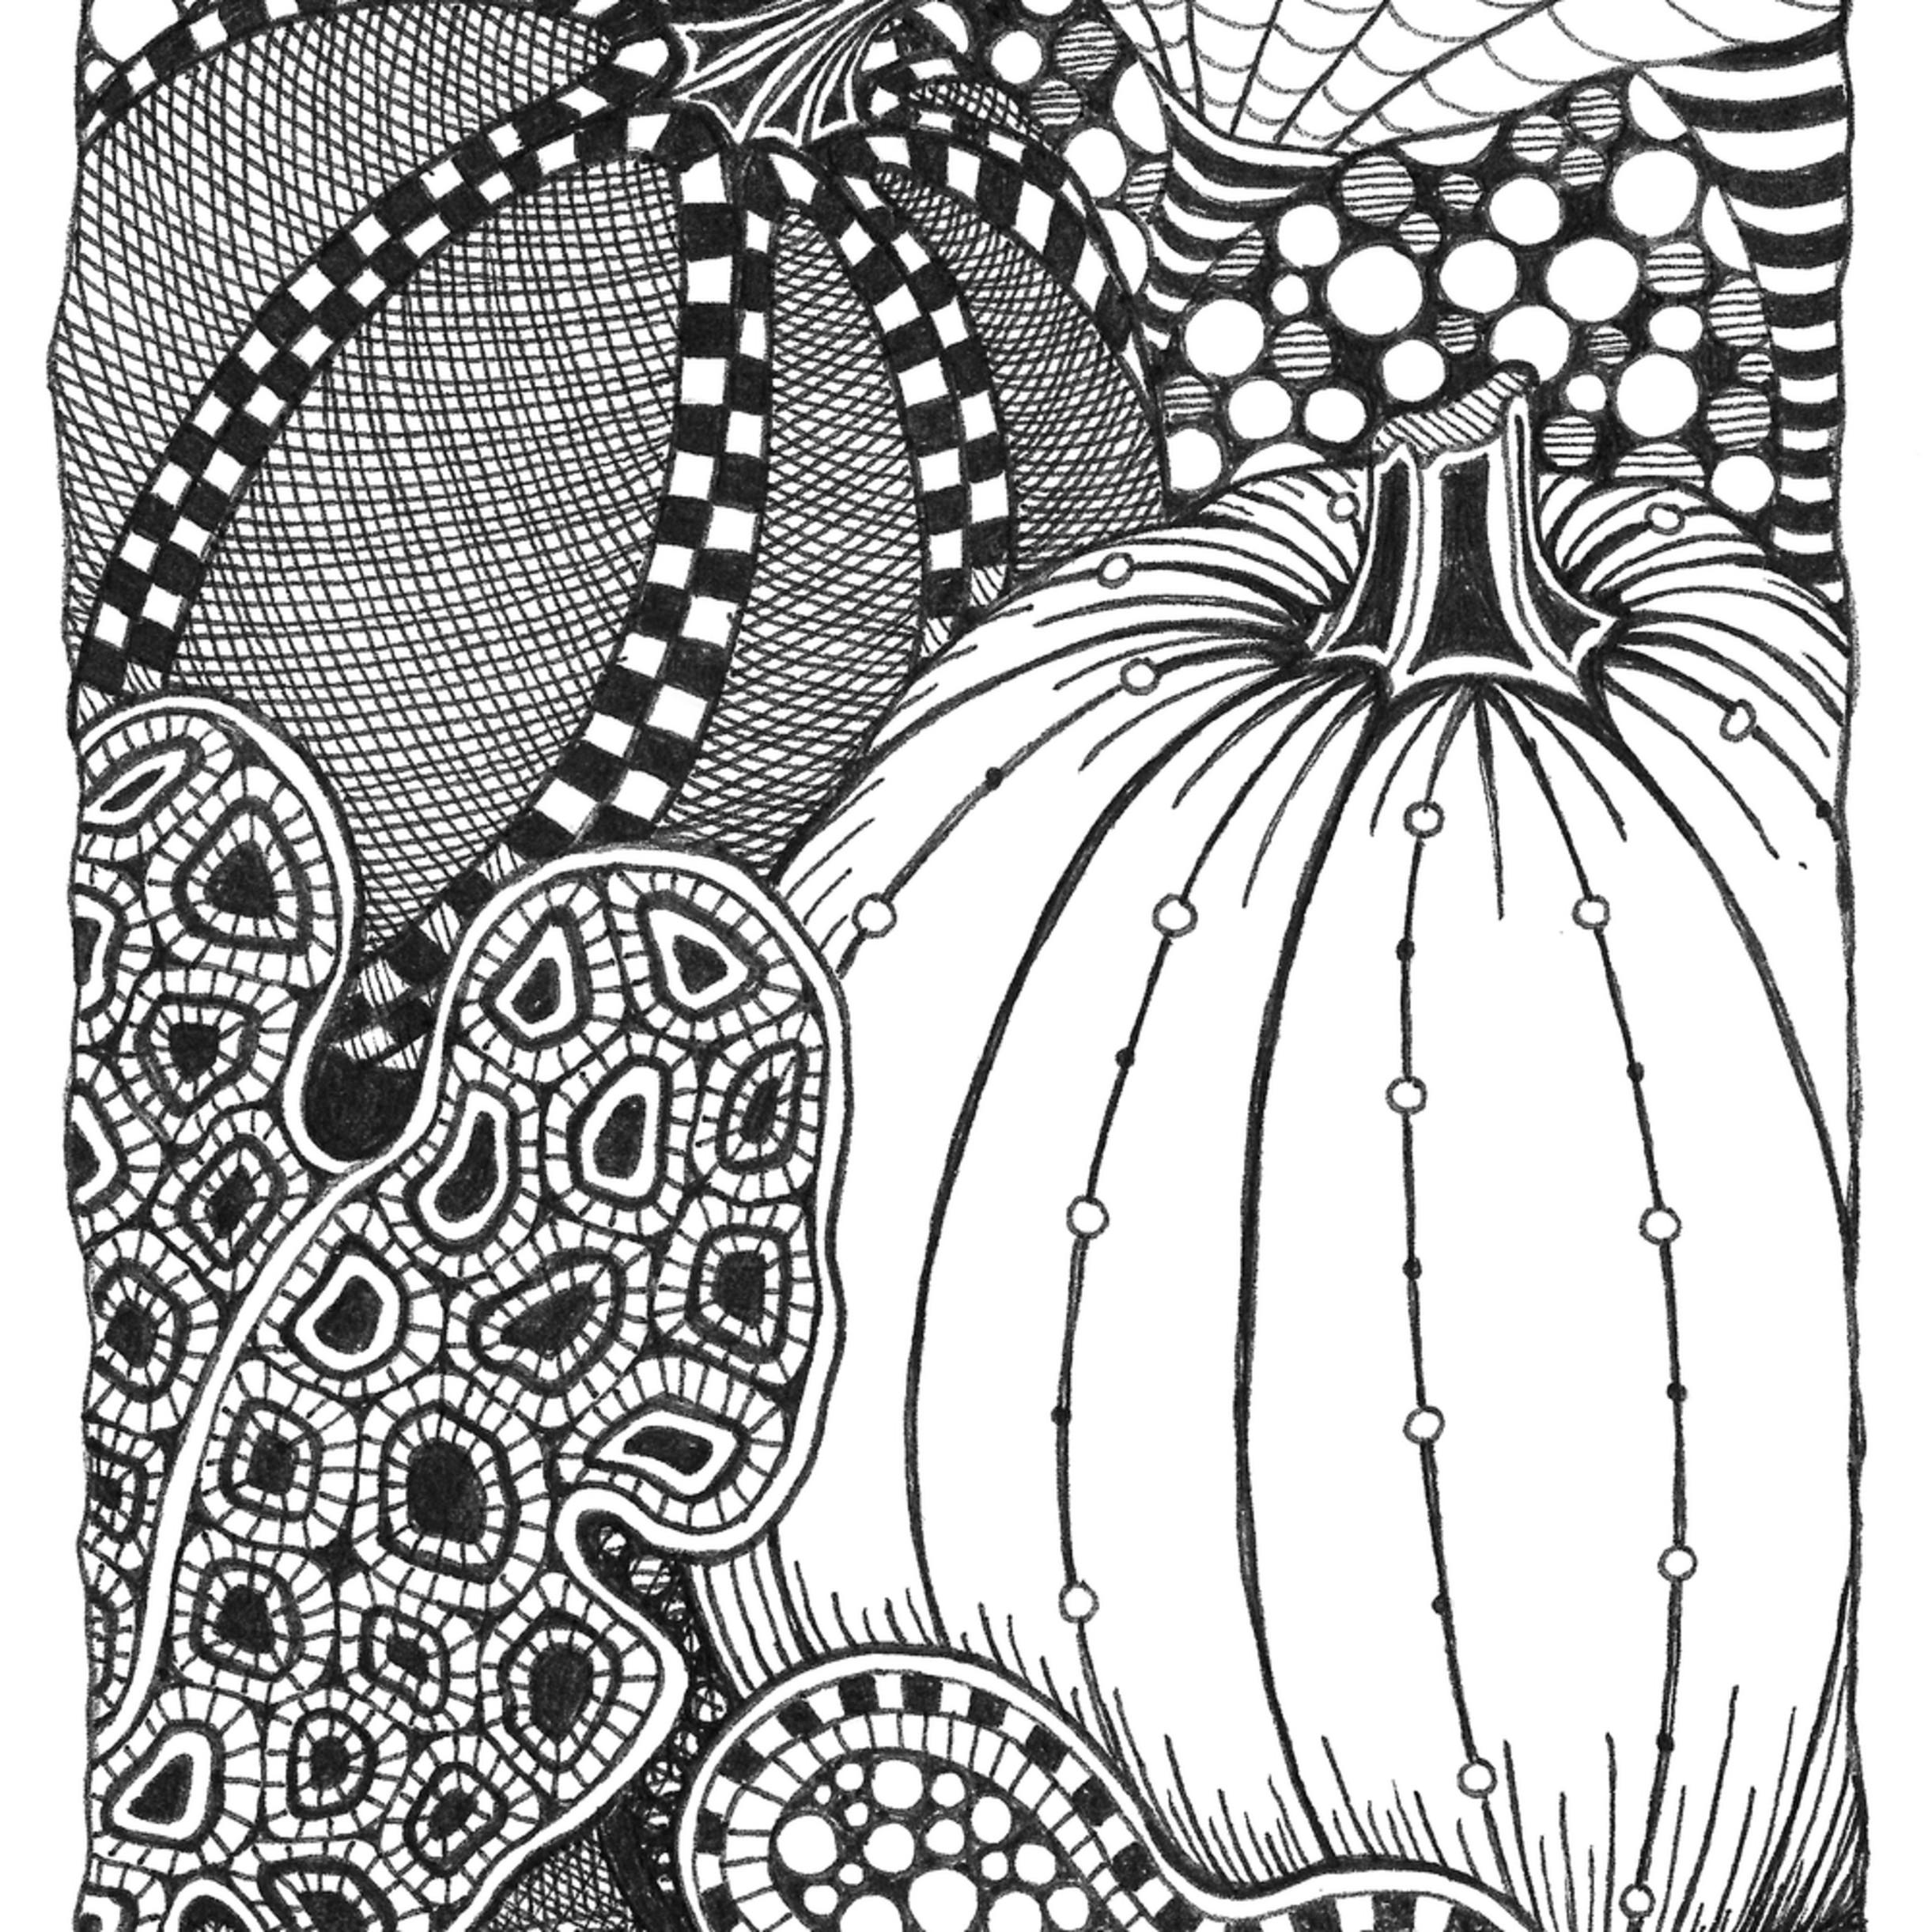 Pumpkin 5 alice in pumpkinland pnsghf